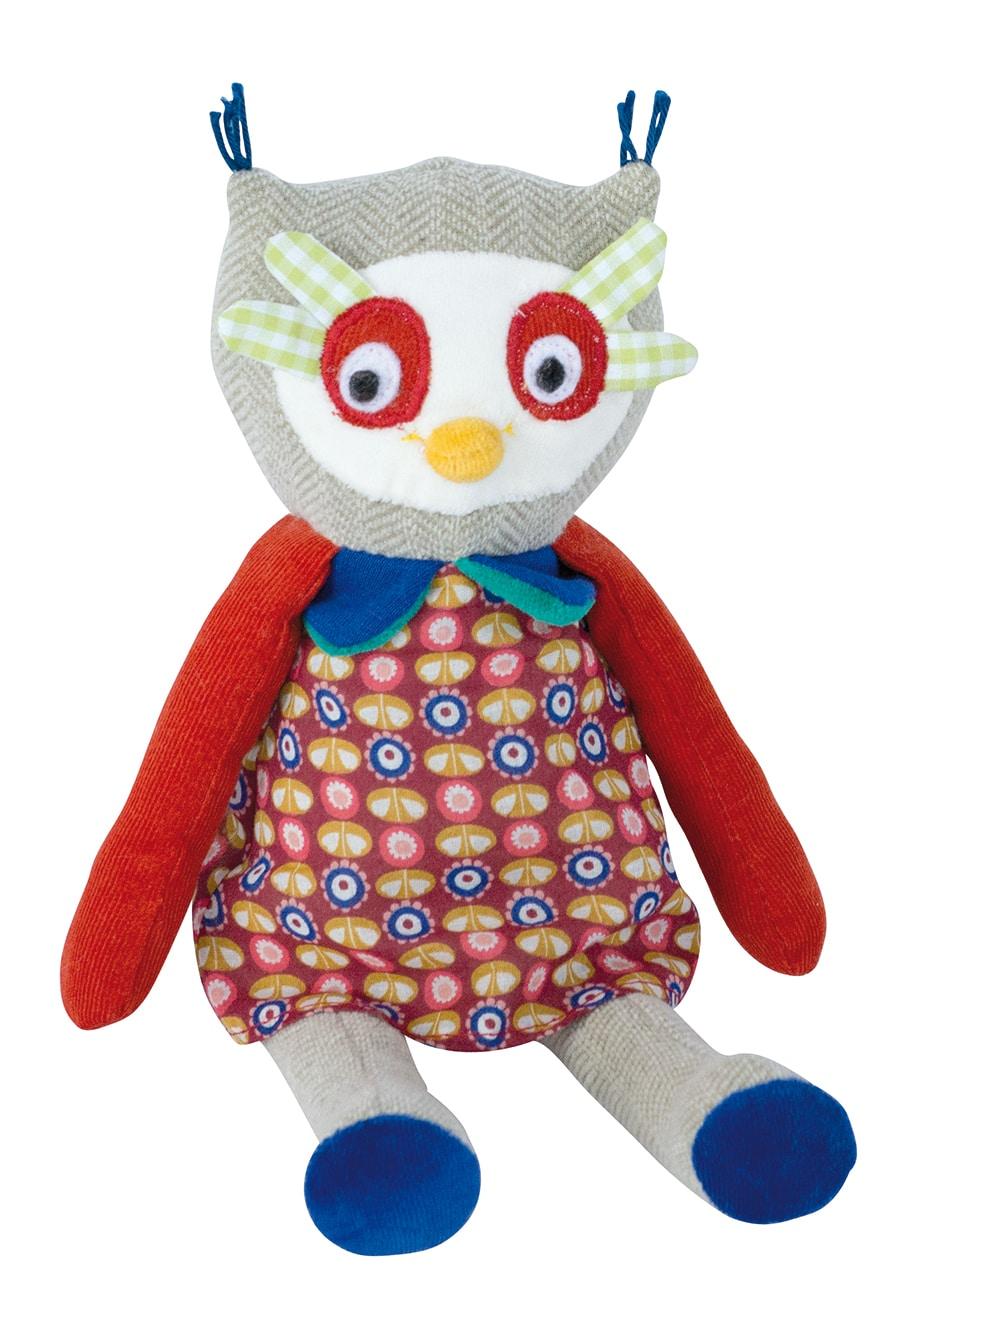 French Knitting Owl Doll : Les popipop owl doll moulin roty little snail